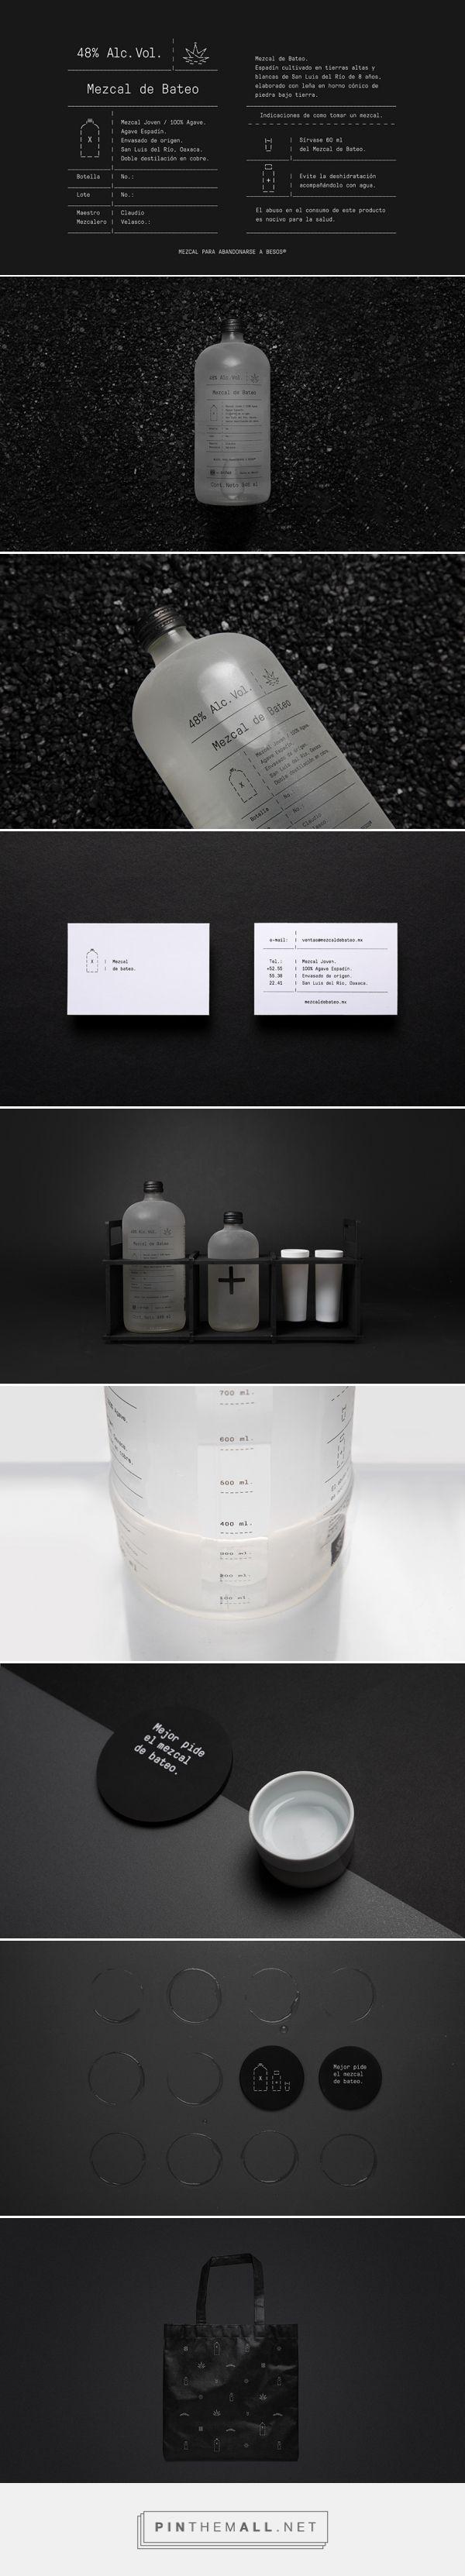 Mezcal de bateo packaging branding by Futura